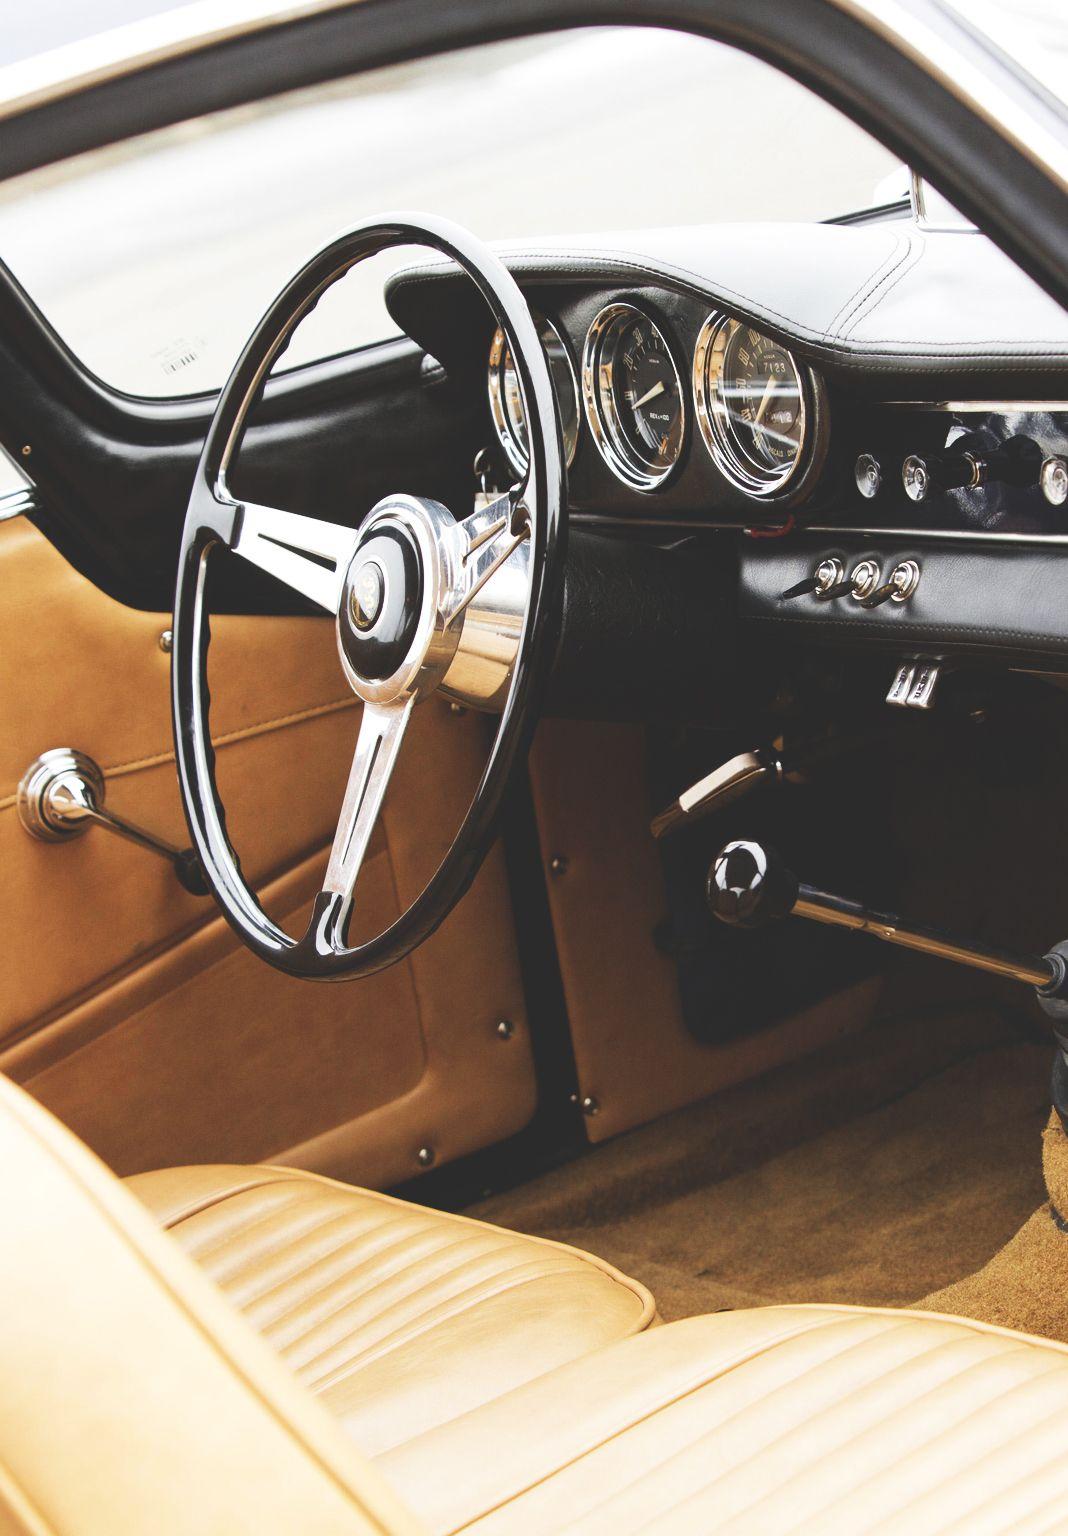 Alfa Romeo Interior Lease An With Premier Financial Finance Auto Alfaromeo